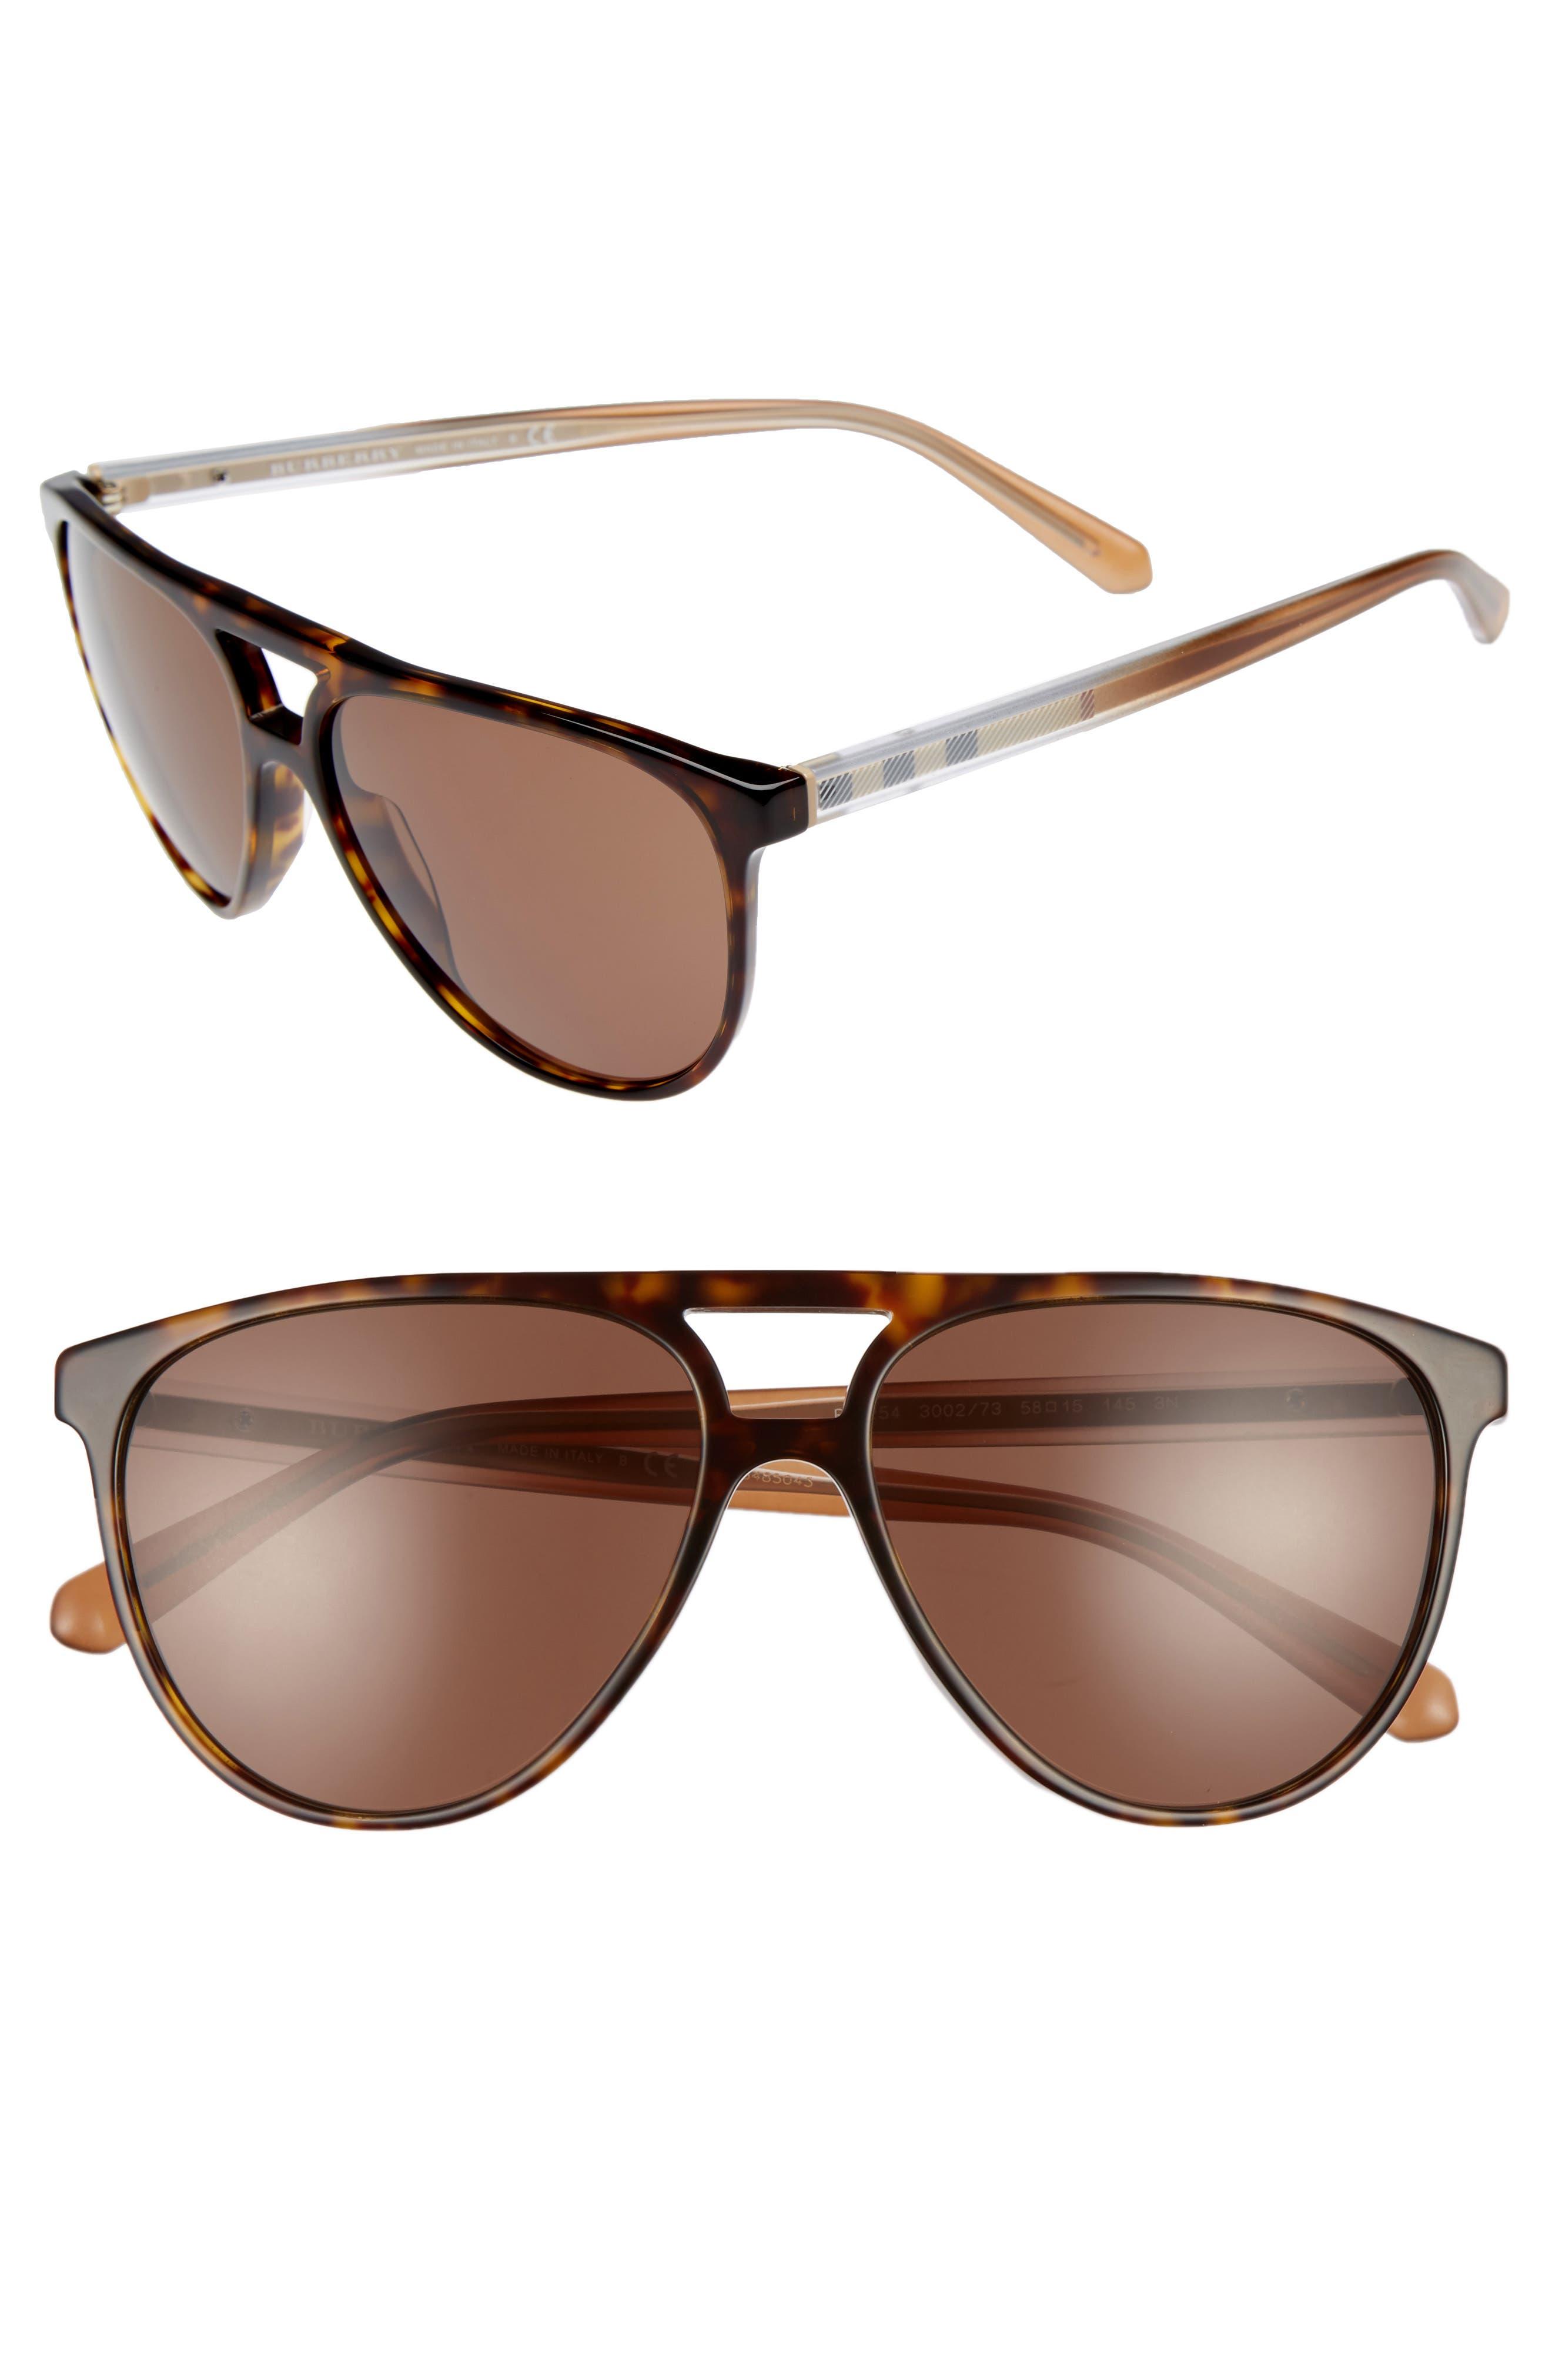 58mm Aviator Sunglasses,                         Main,                         color, Dark Havana